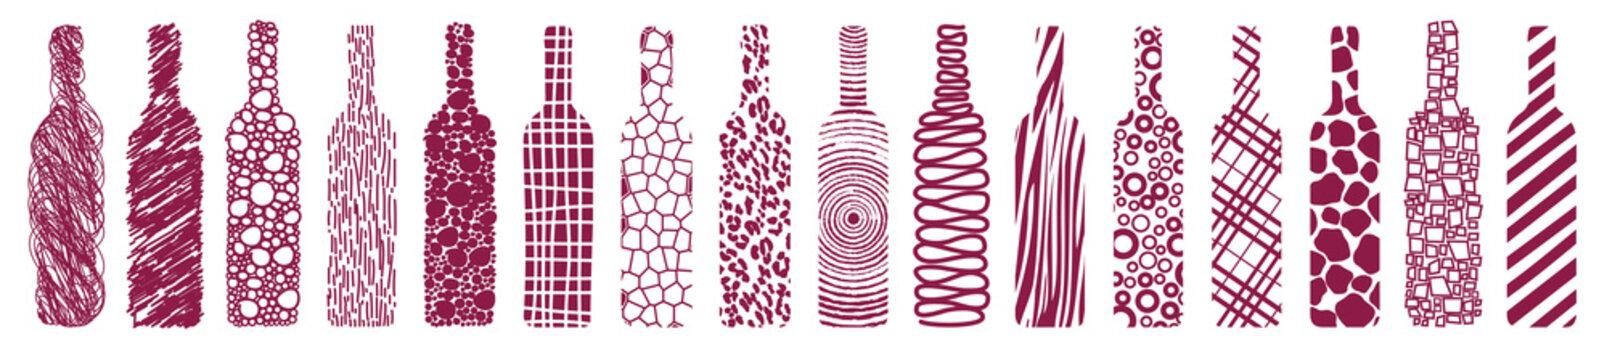 wine bottles, abstract, vector